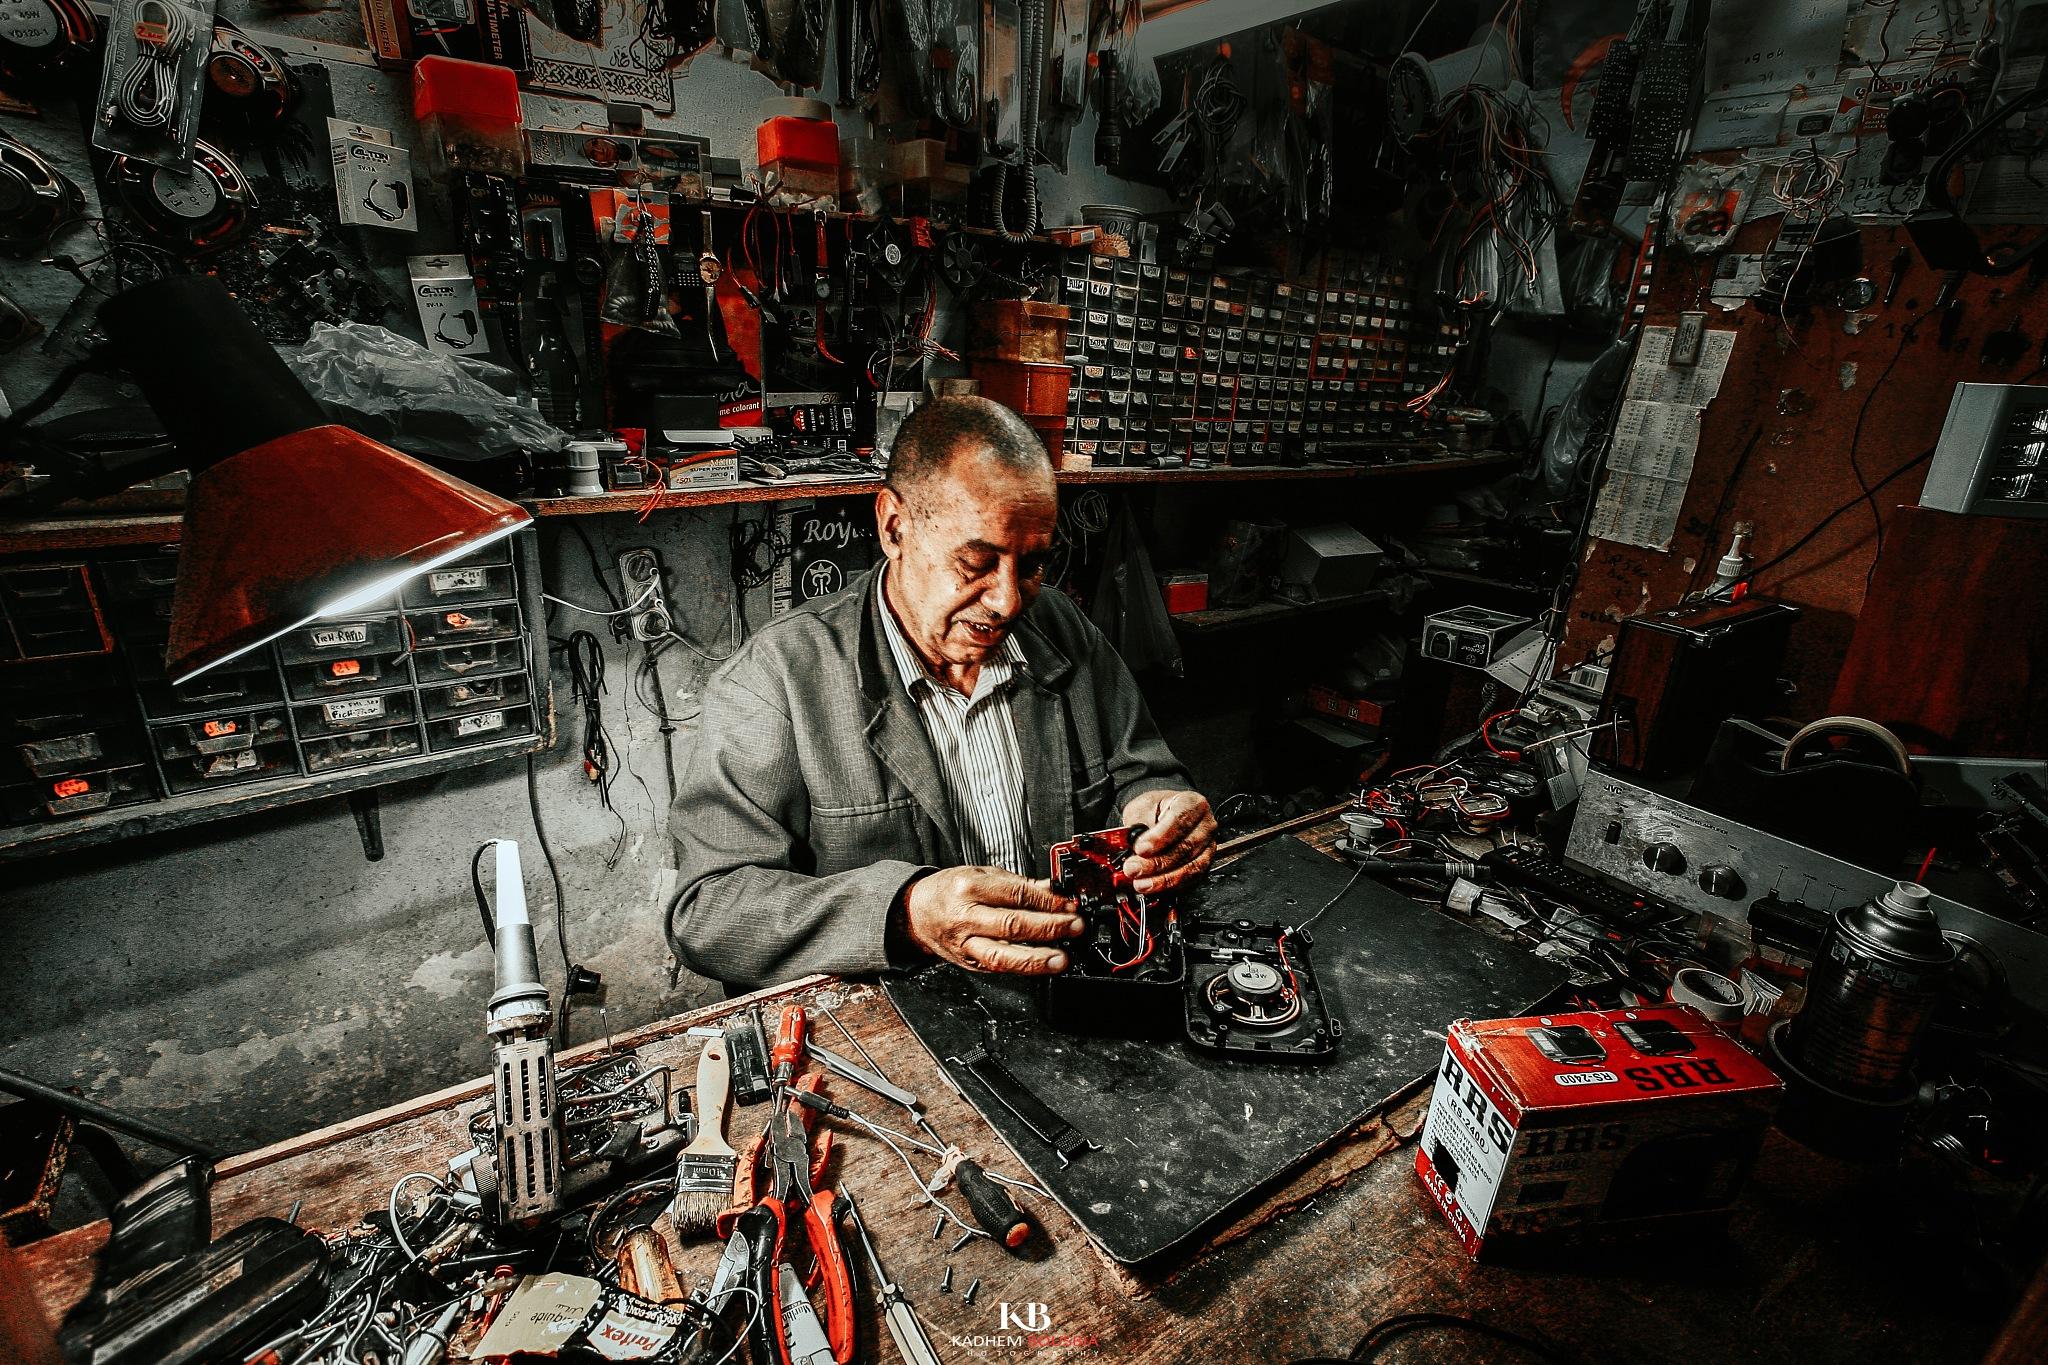 Radio Old Repair II by kadhem bousbia